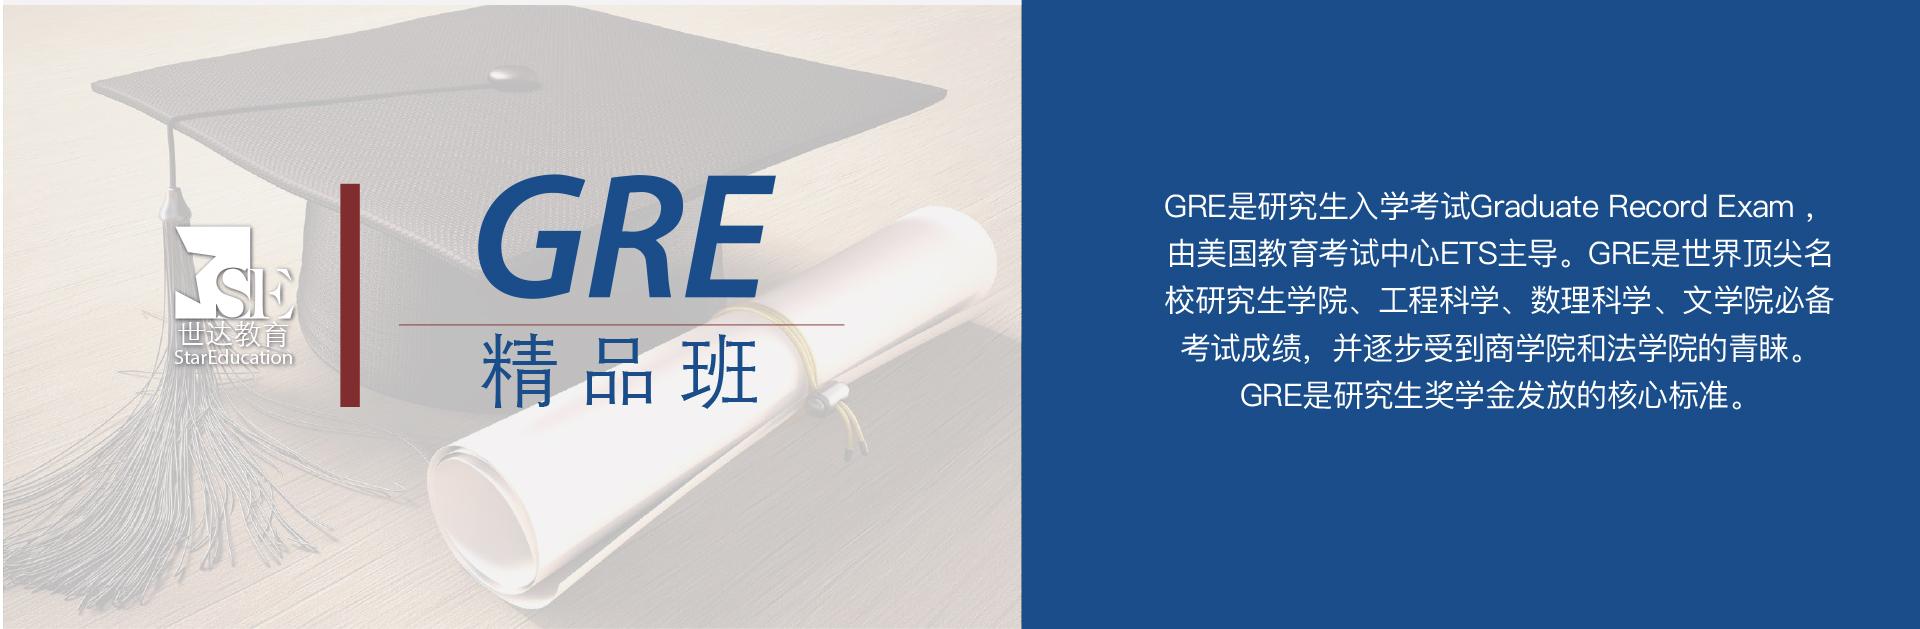 GRE是研究生入学考试Graduate Record Exam , 由美国教育考试中心ETS主导。GRE是世界顶尖名 校研究生学院、工程科学、数理科学、文学院必备 考试成绩,并逐步受到商学院和法学院的青睐。 GRE是研究生奖学金发放的核心标准。